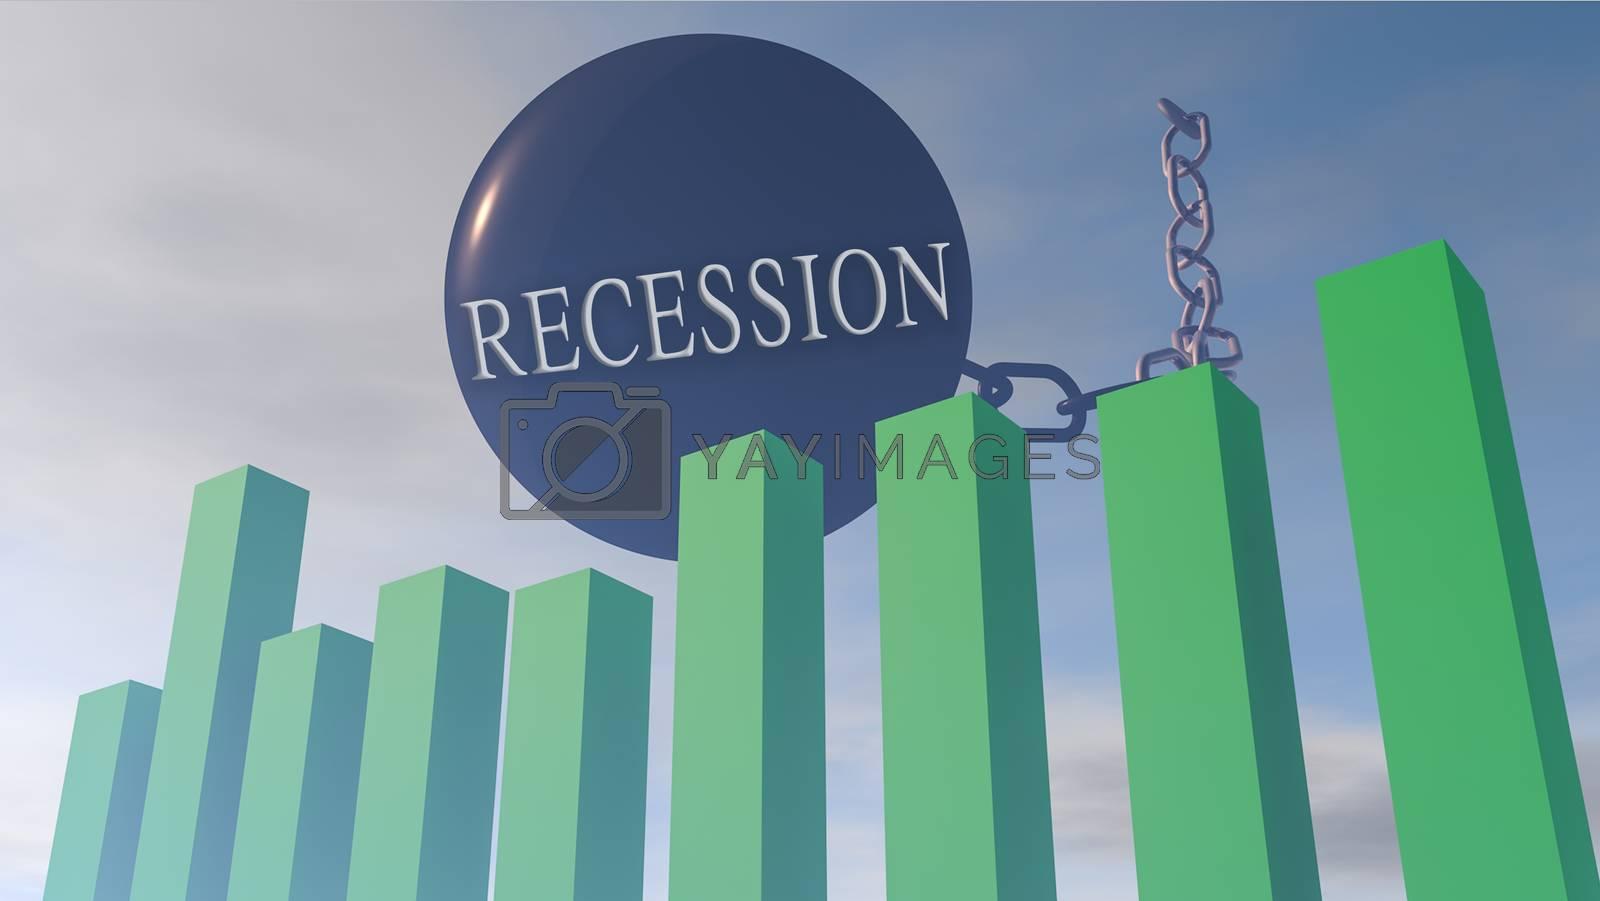 3D rendering illustration of financial stock market influenced by 3D rendering illustration of financial stock market influenced by recession